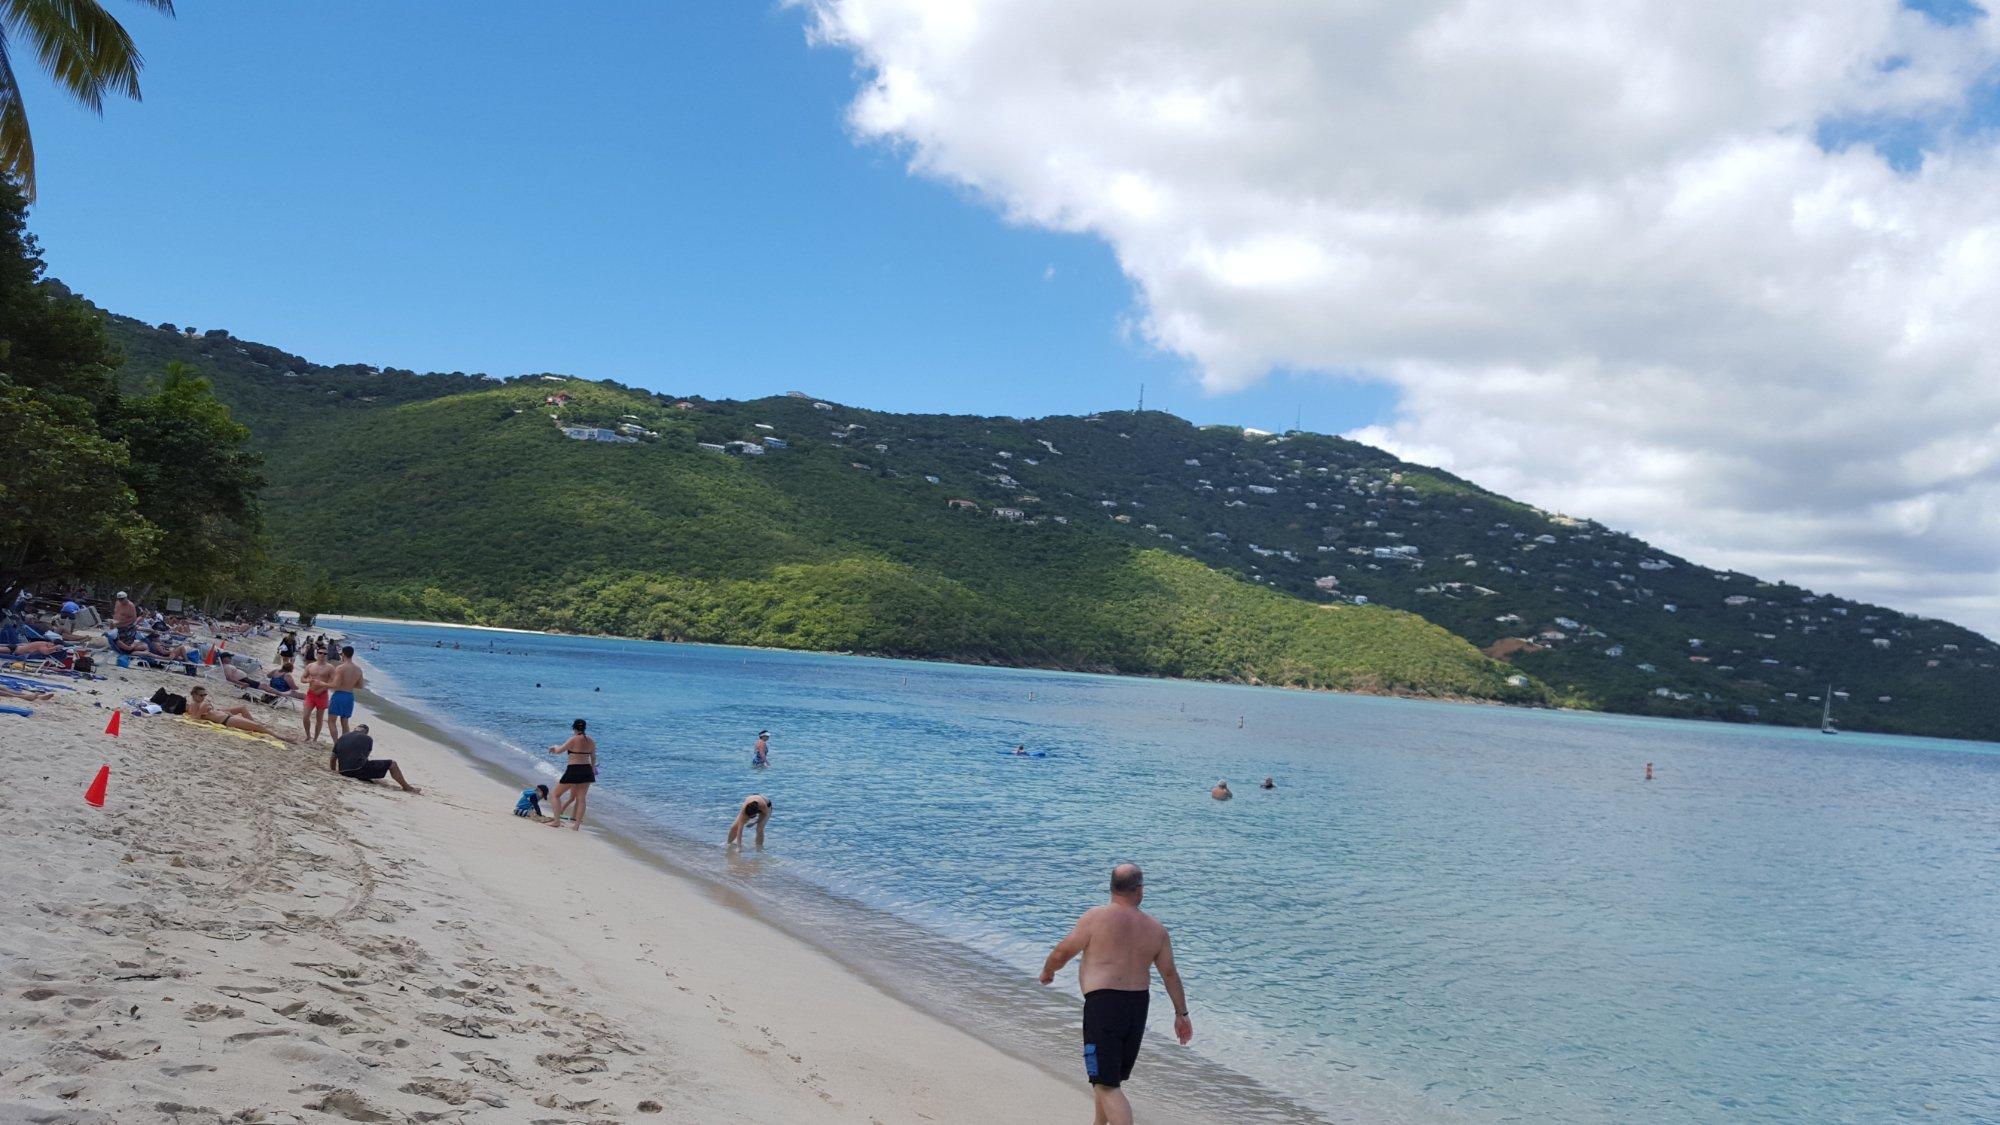 Megan's Bay Beach